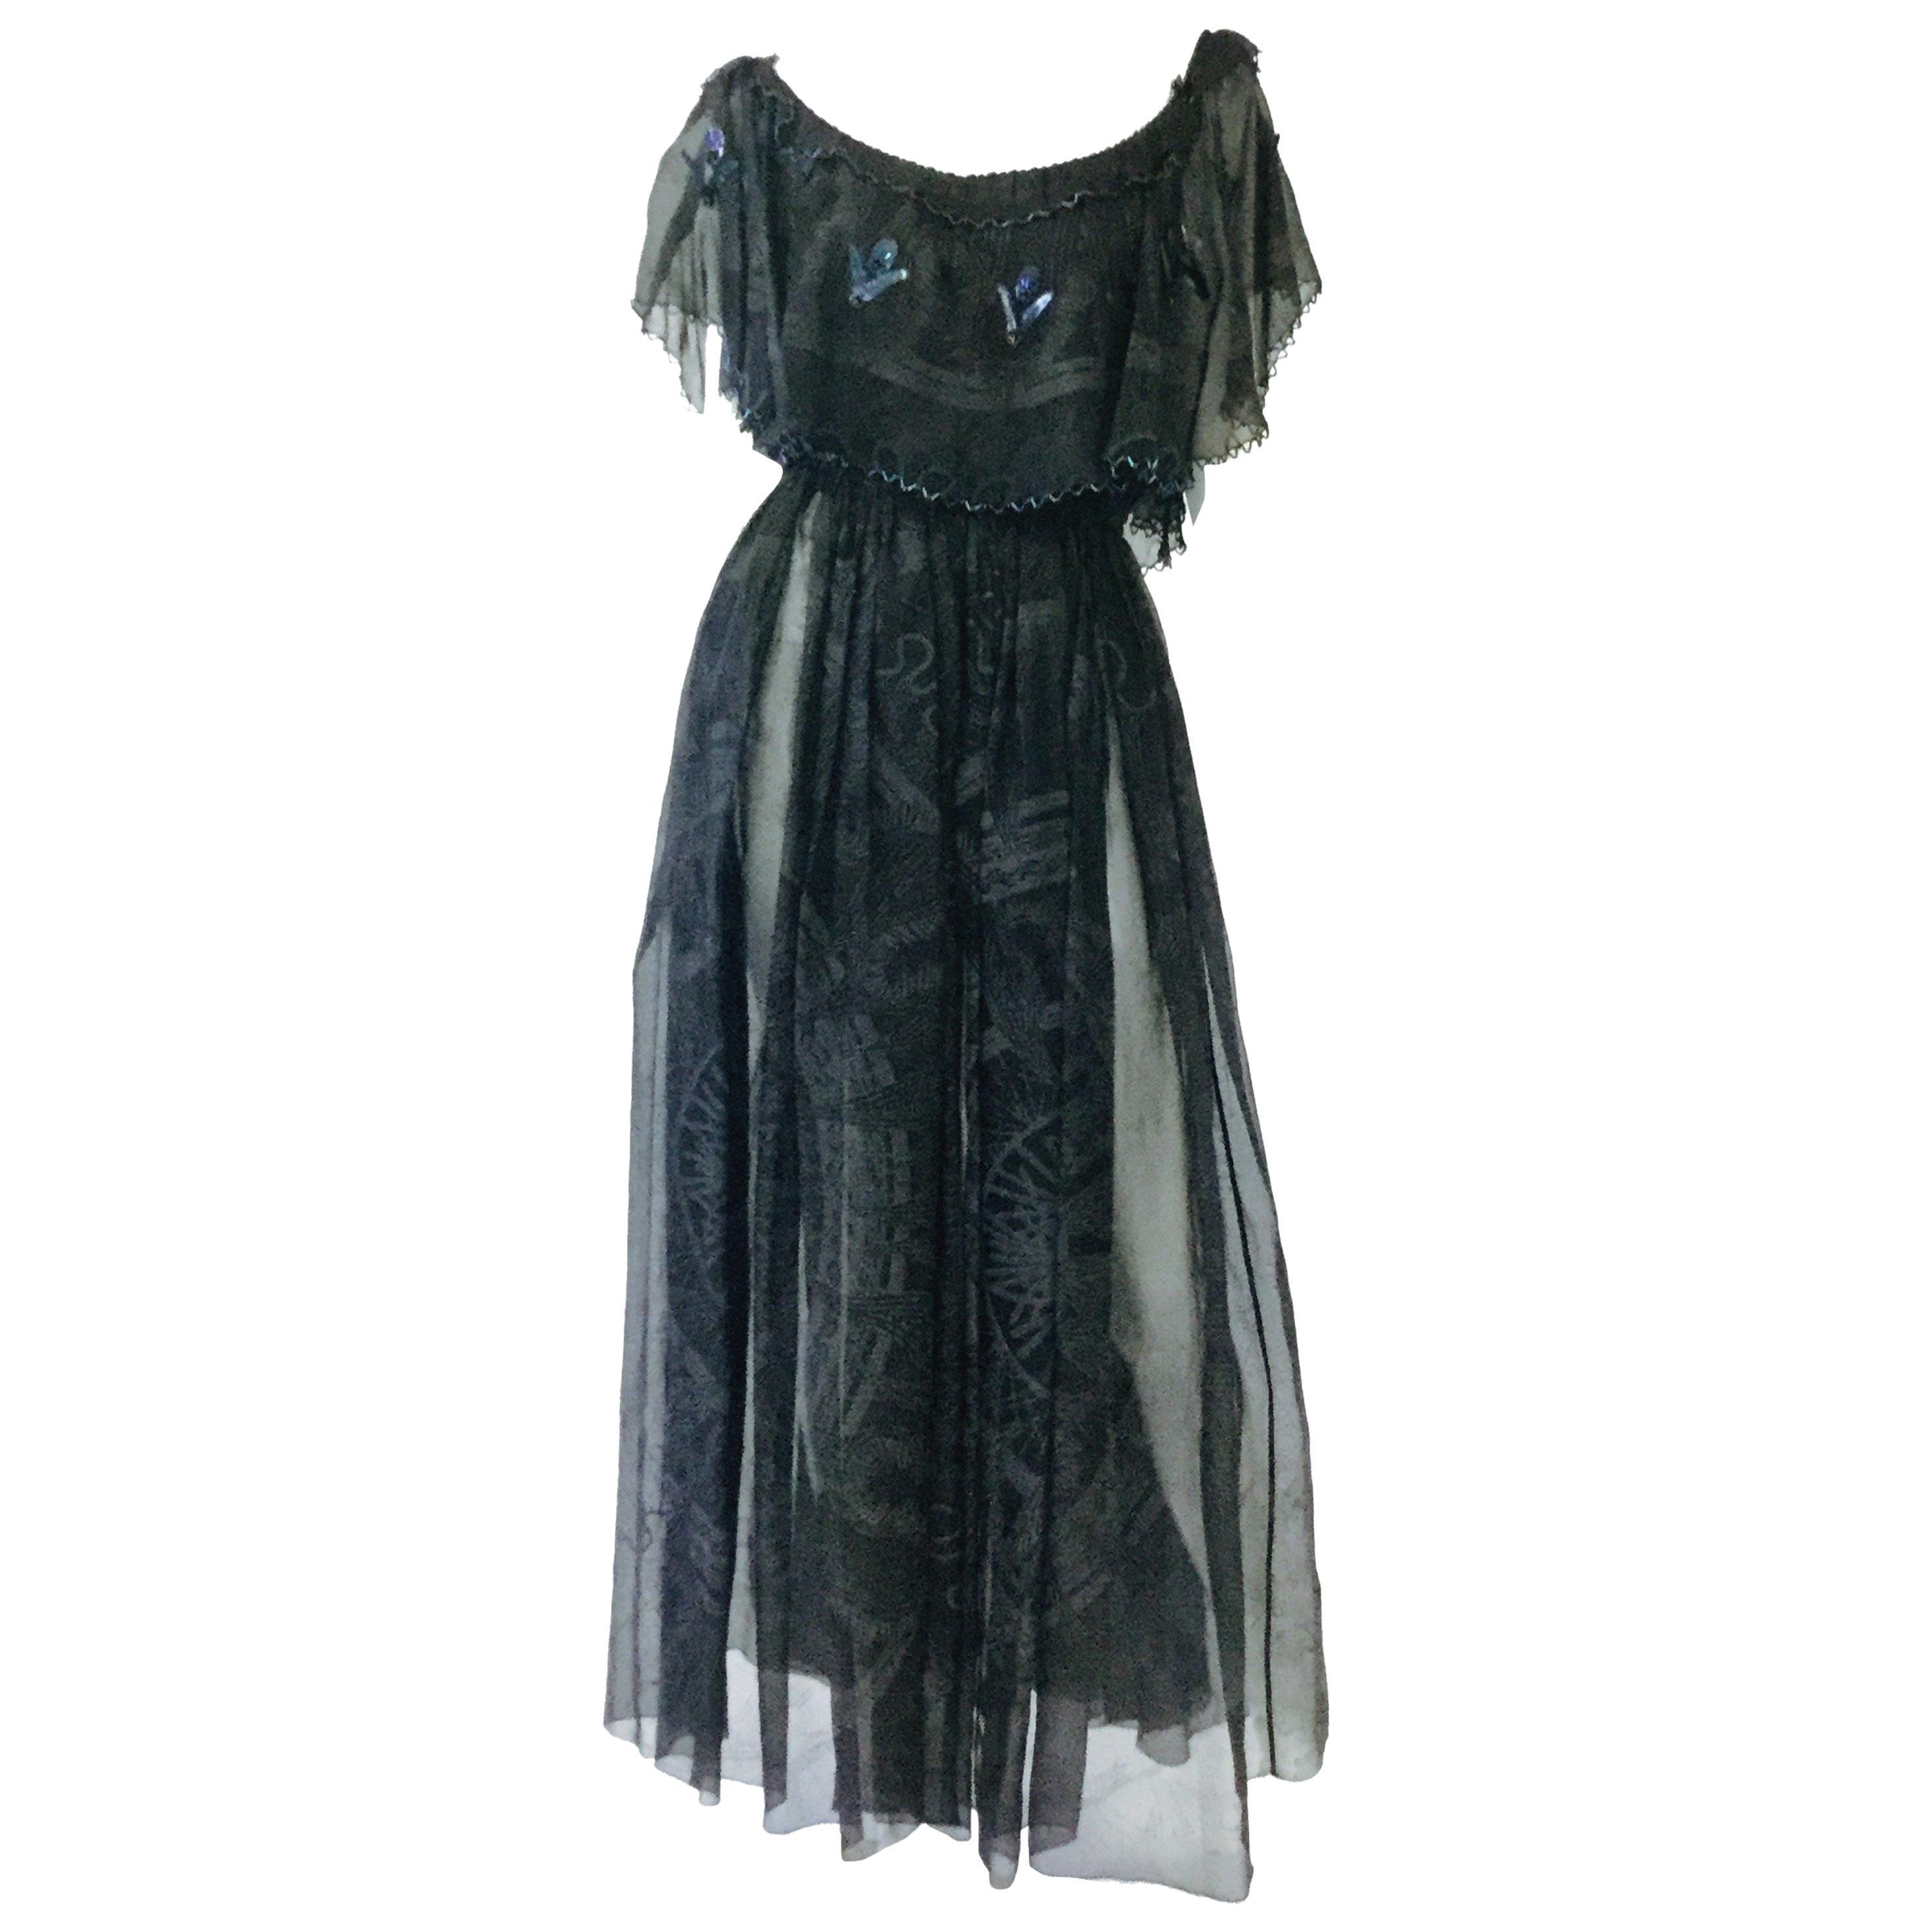 1970s Zandra Rhodes Hand Painted Black Silk Dress